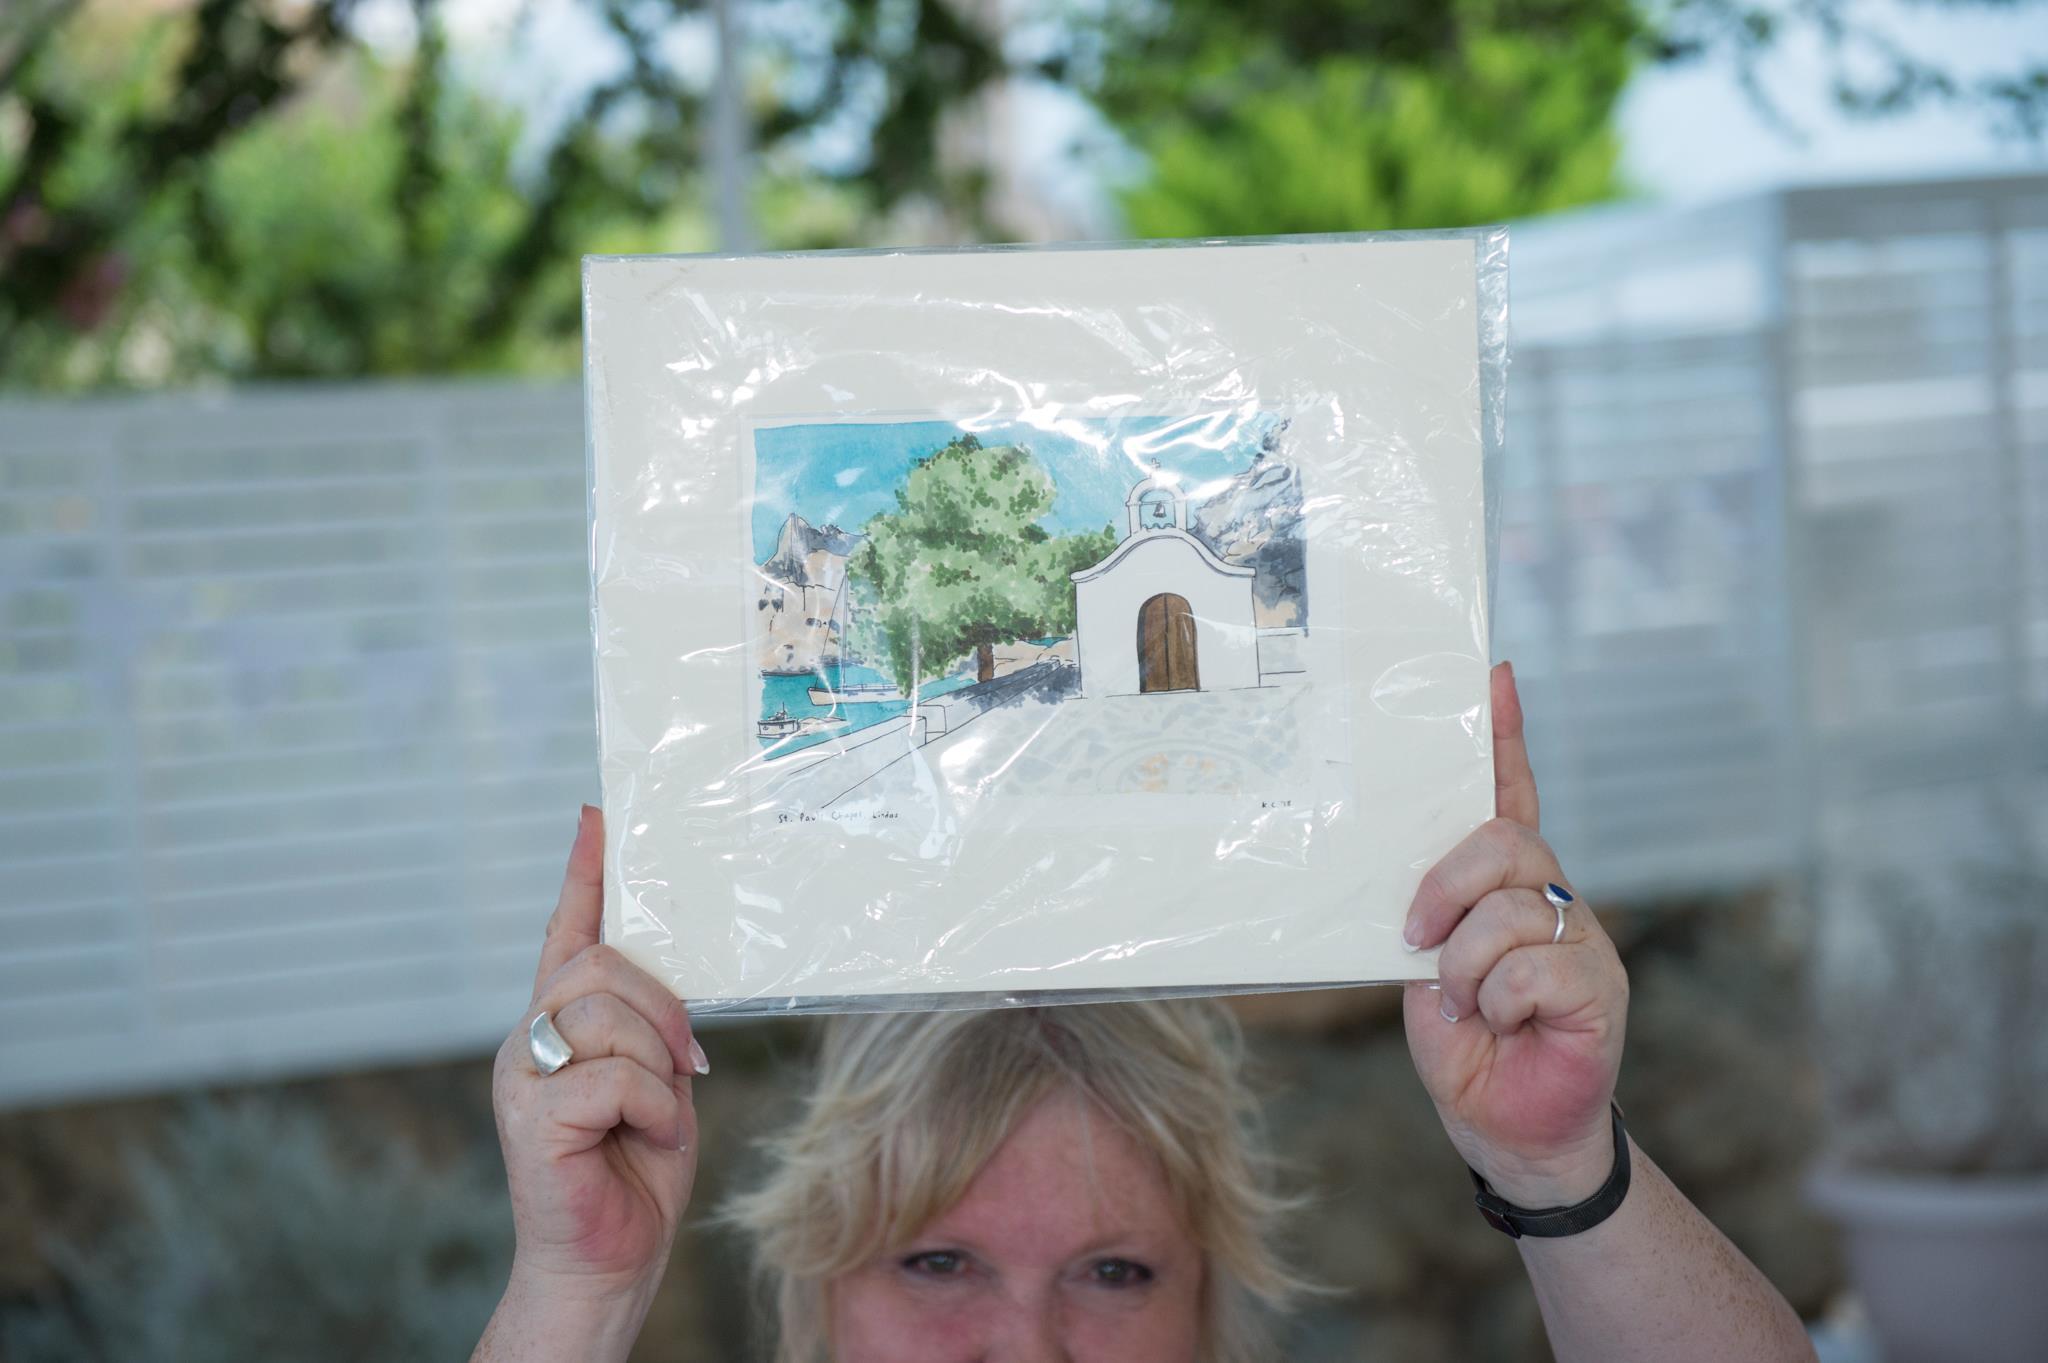 wedding venue illustrated portrait painting greece overseas katie chappell illustration.jpg